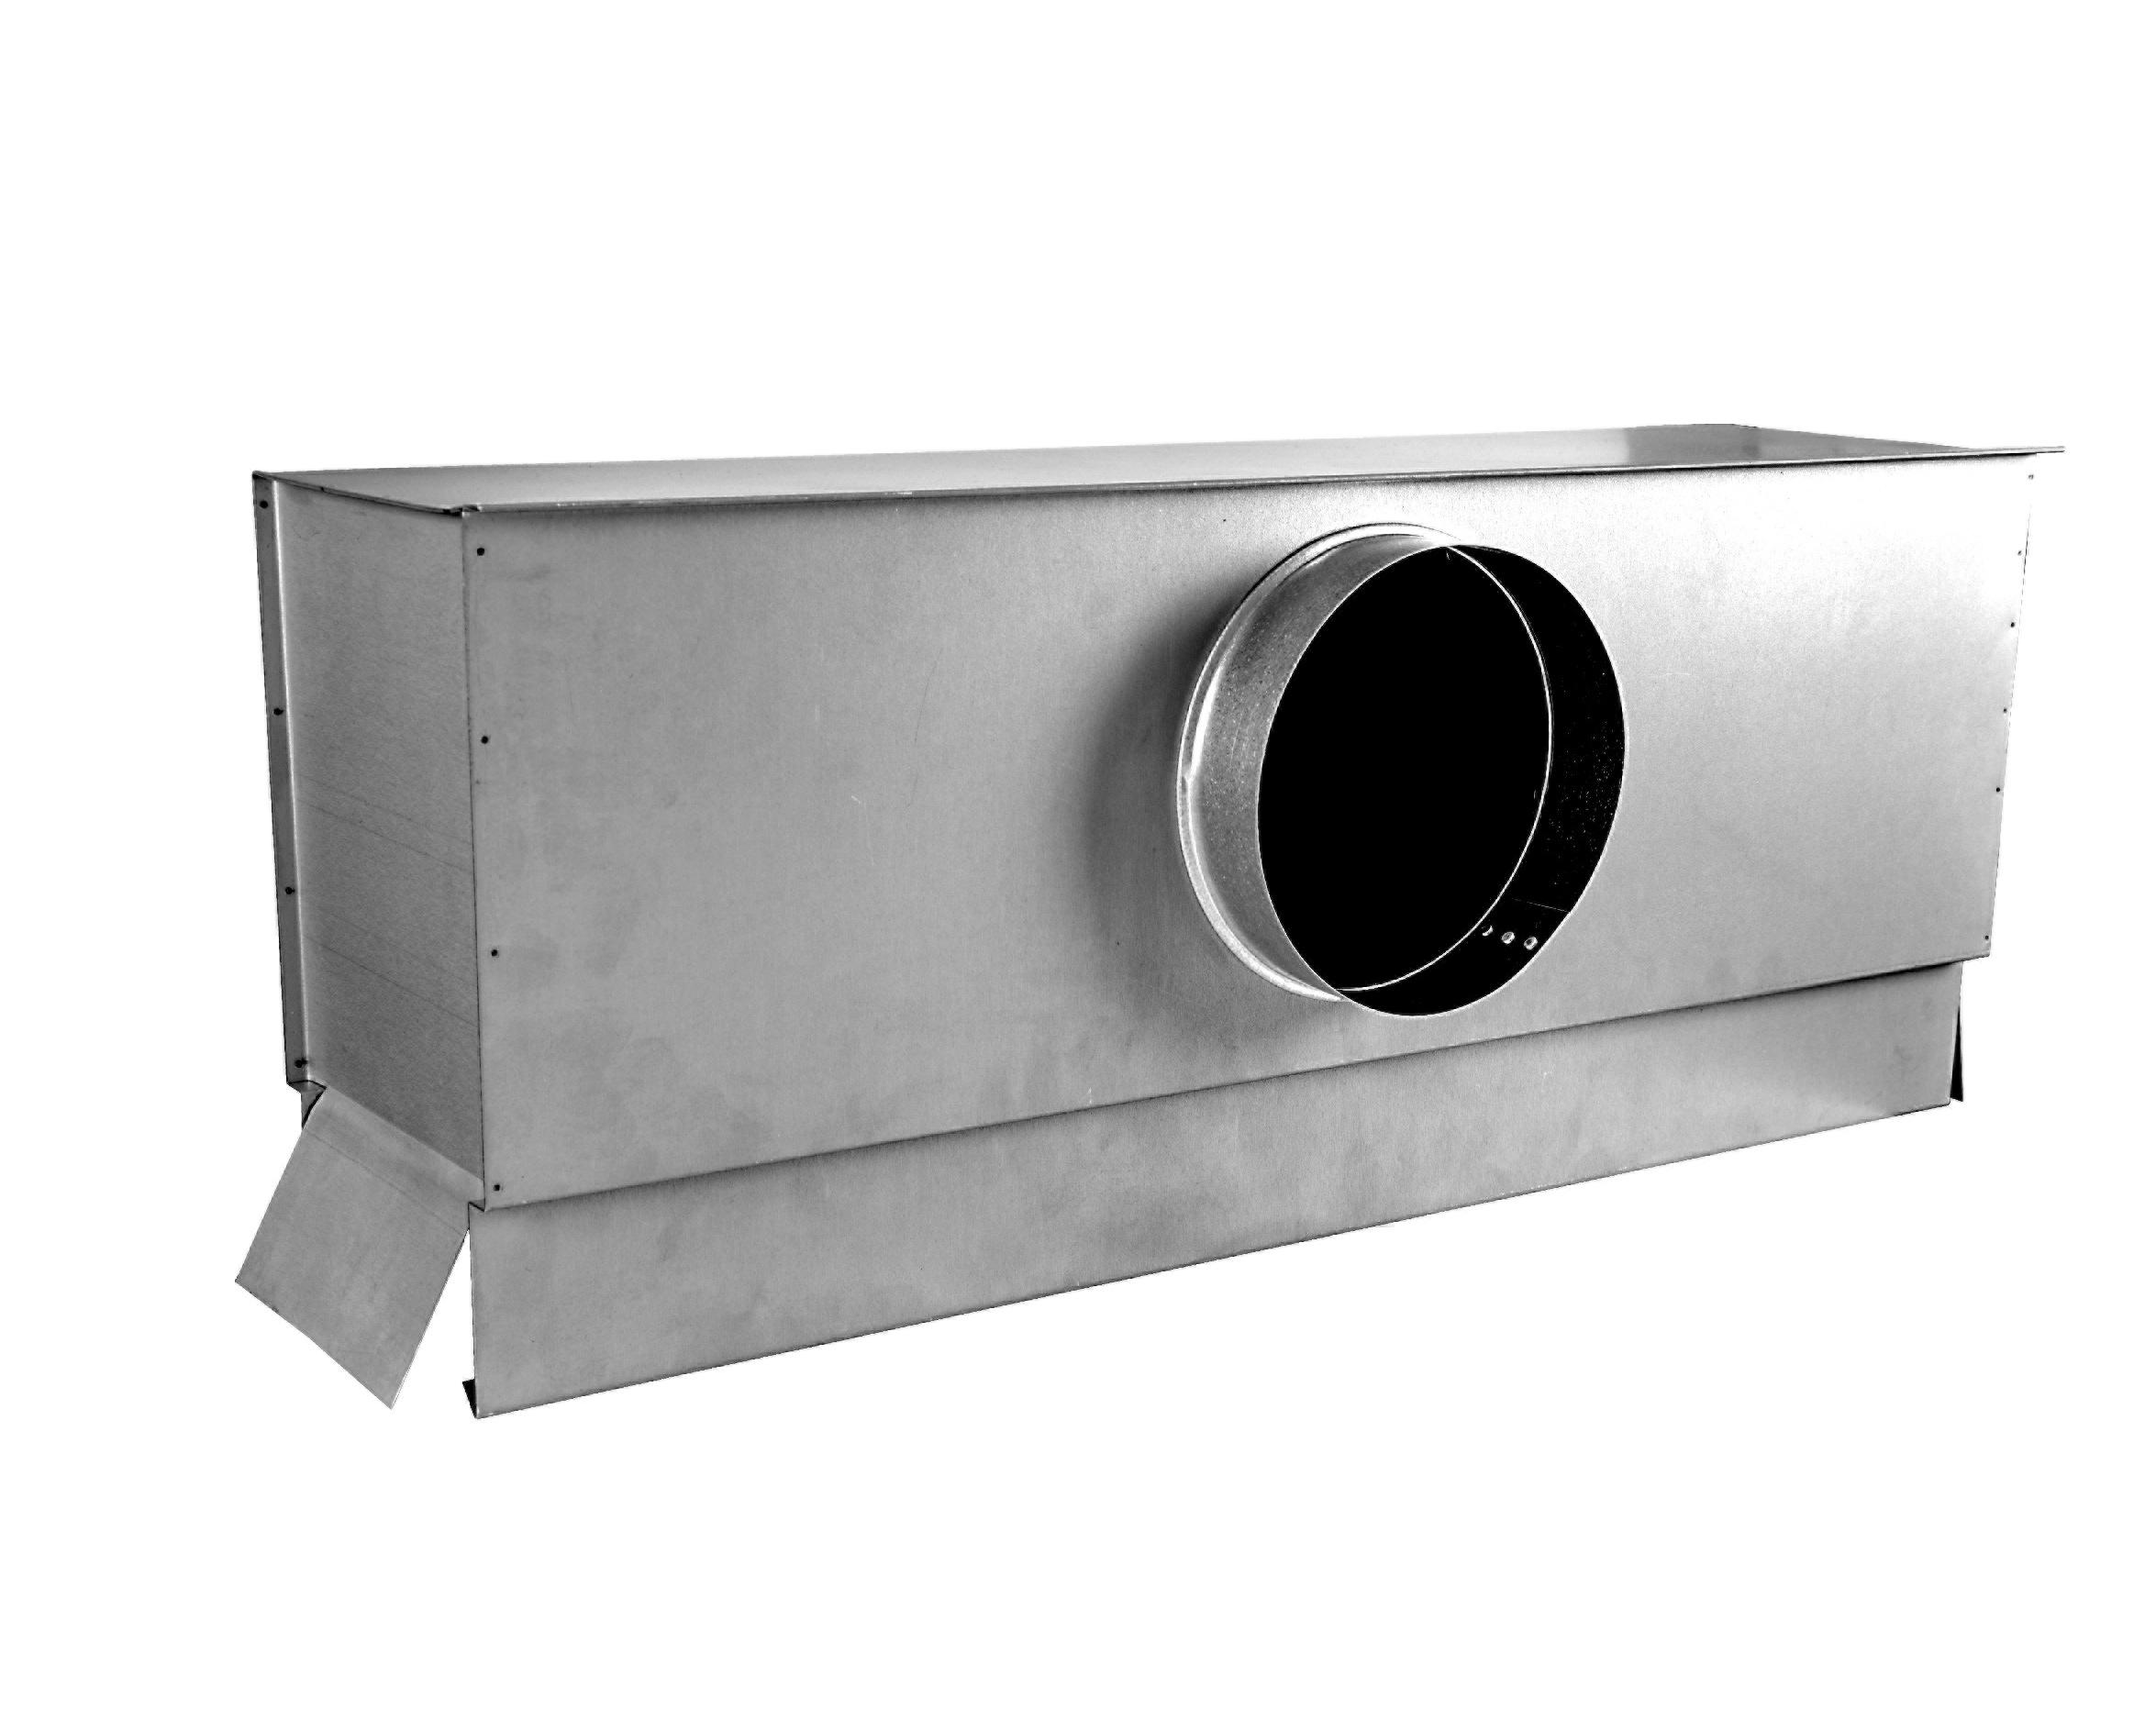 Linear Slot Diffuser 4 : Ps distribution plenum airmate